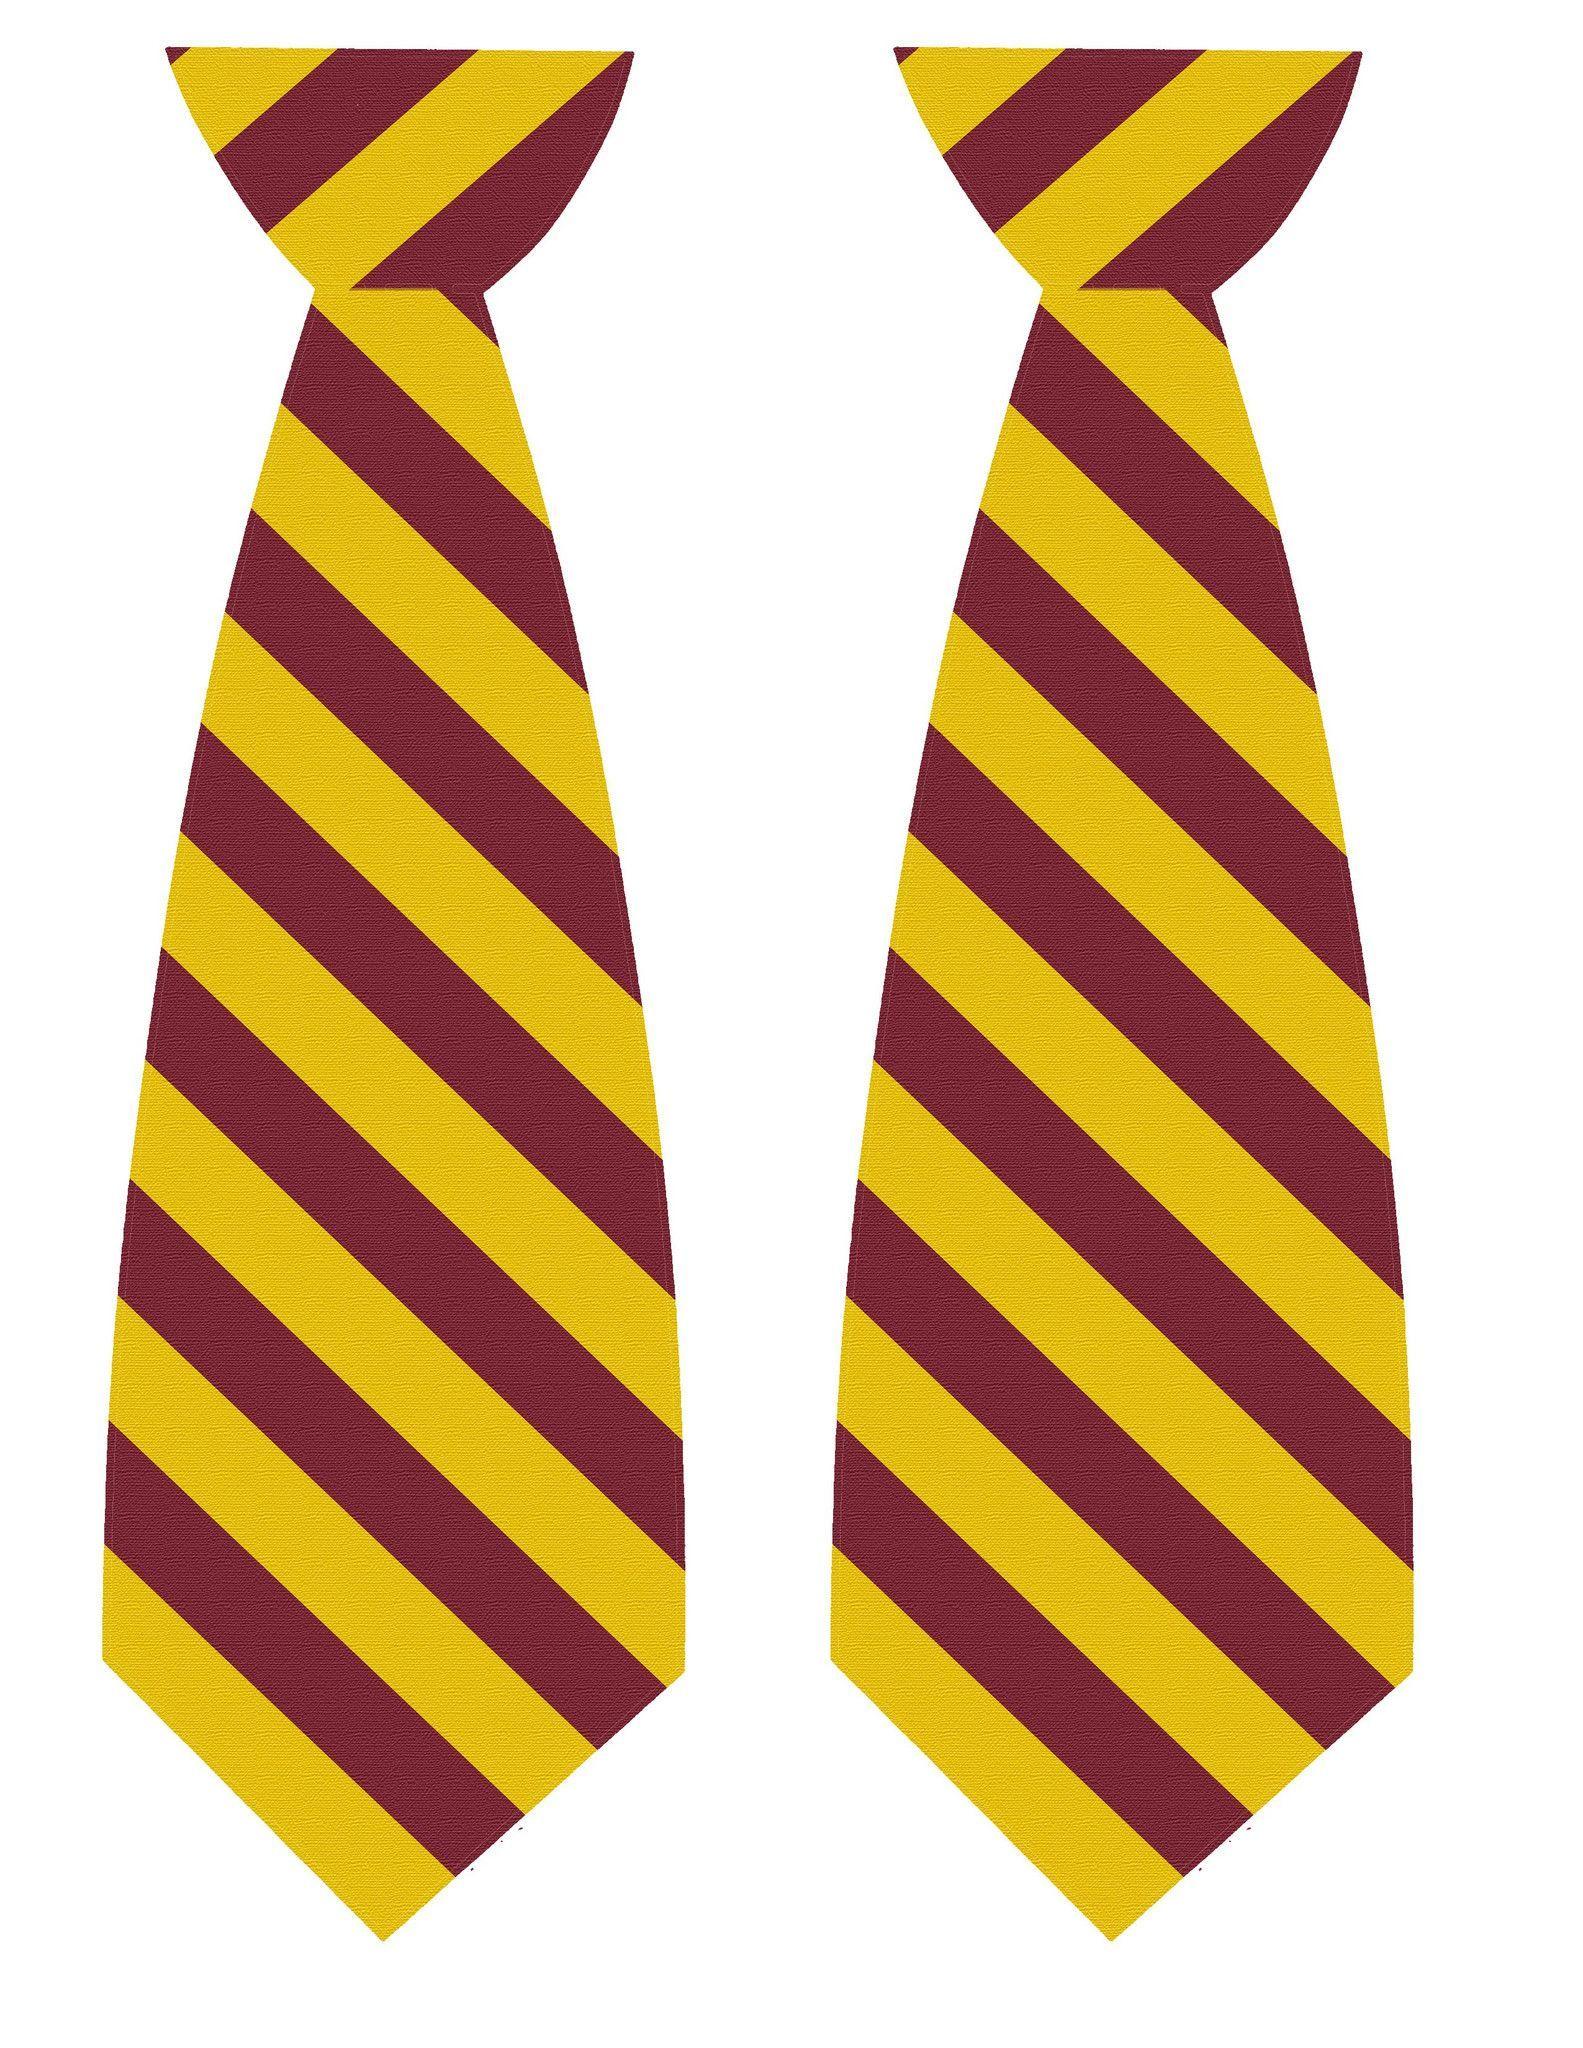 Harry Potter Tie Printables Harry Potter Tie Harry Potter